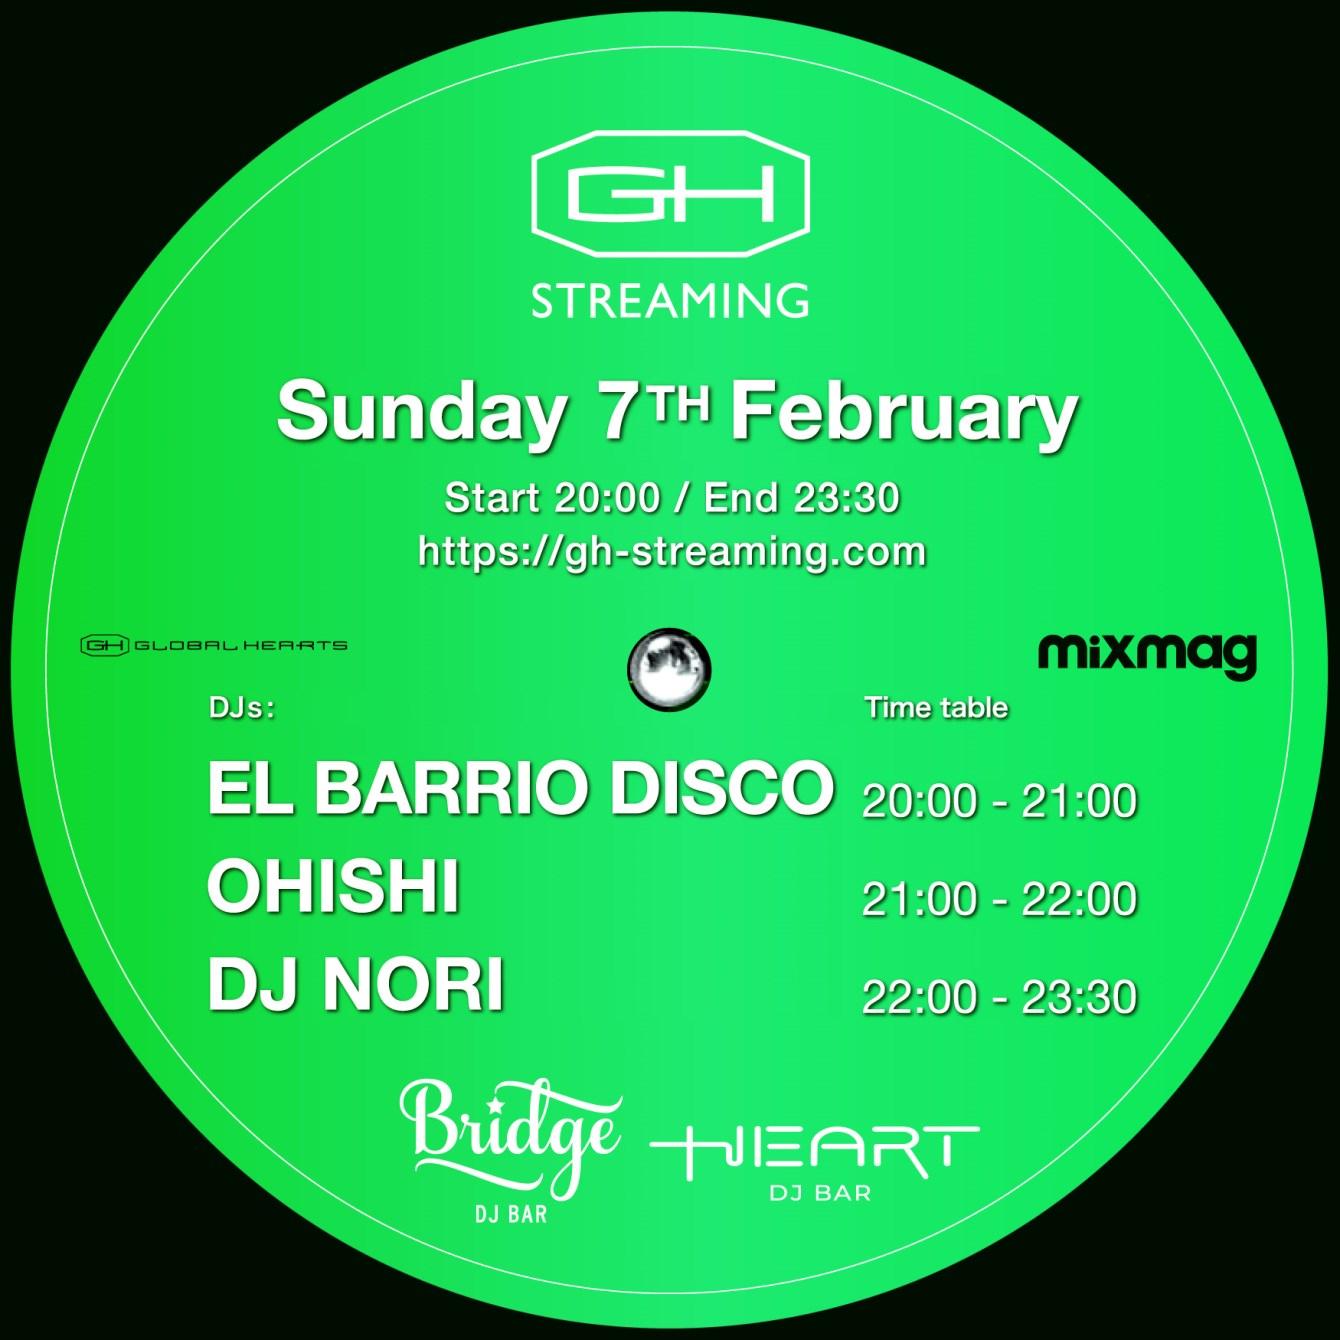 GH Streaming - DJ Nori, Ohishi, EL Barrio Disco - - Flyer front